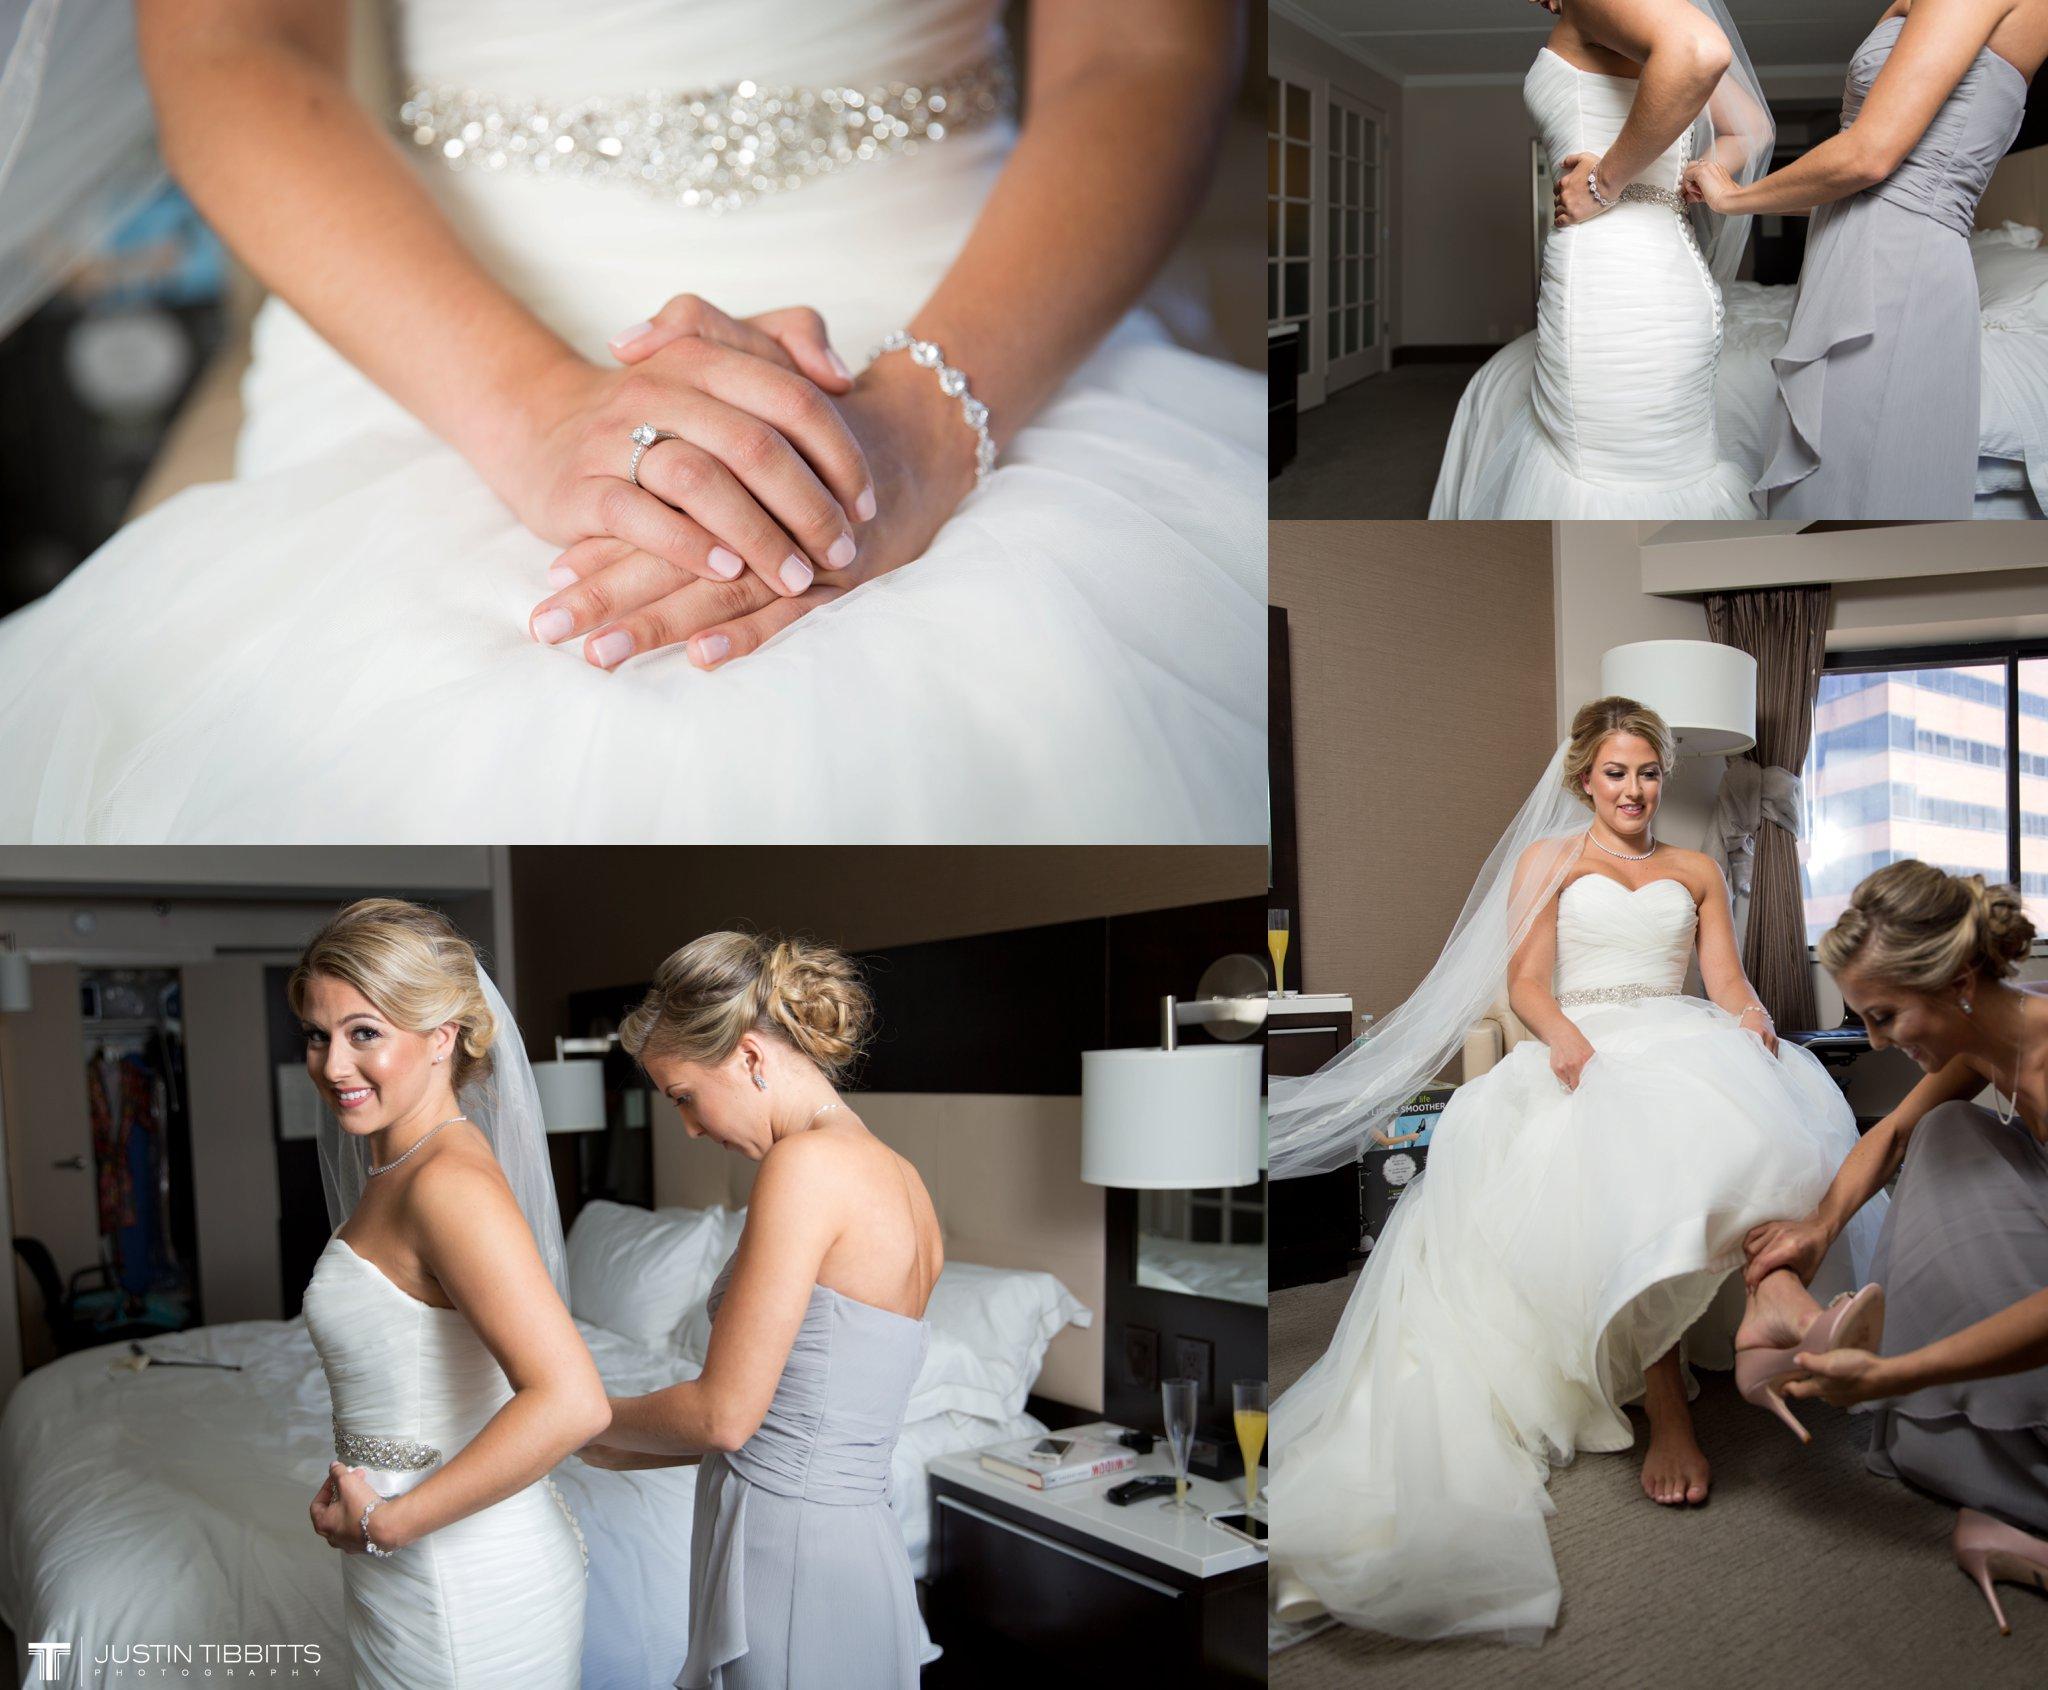 state-room-wedding-photos-with-amanda-and-nick_0037